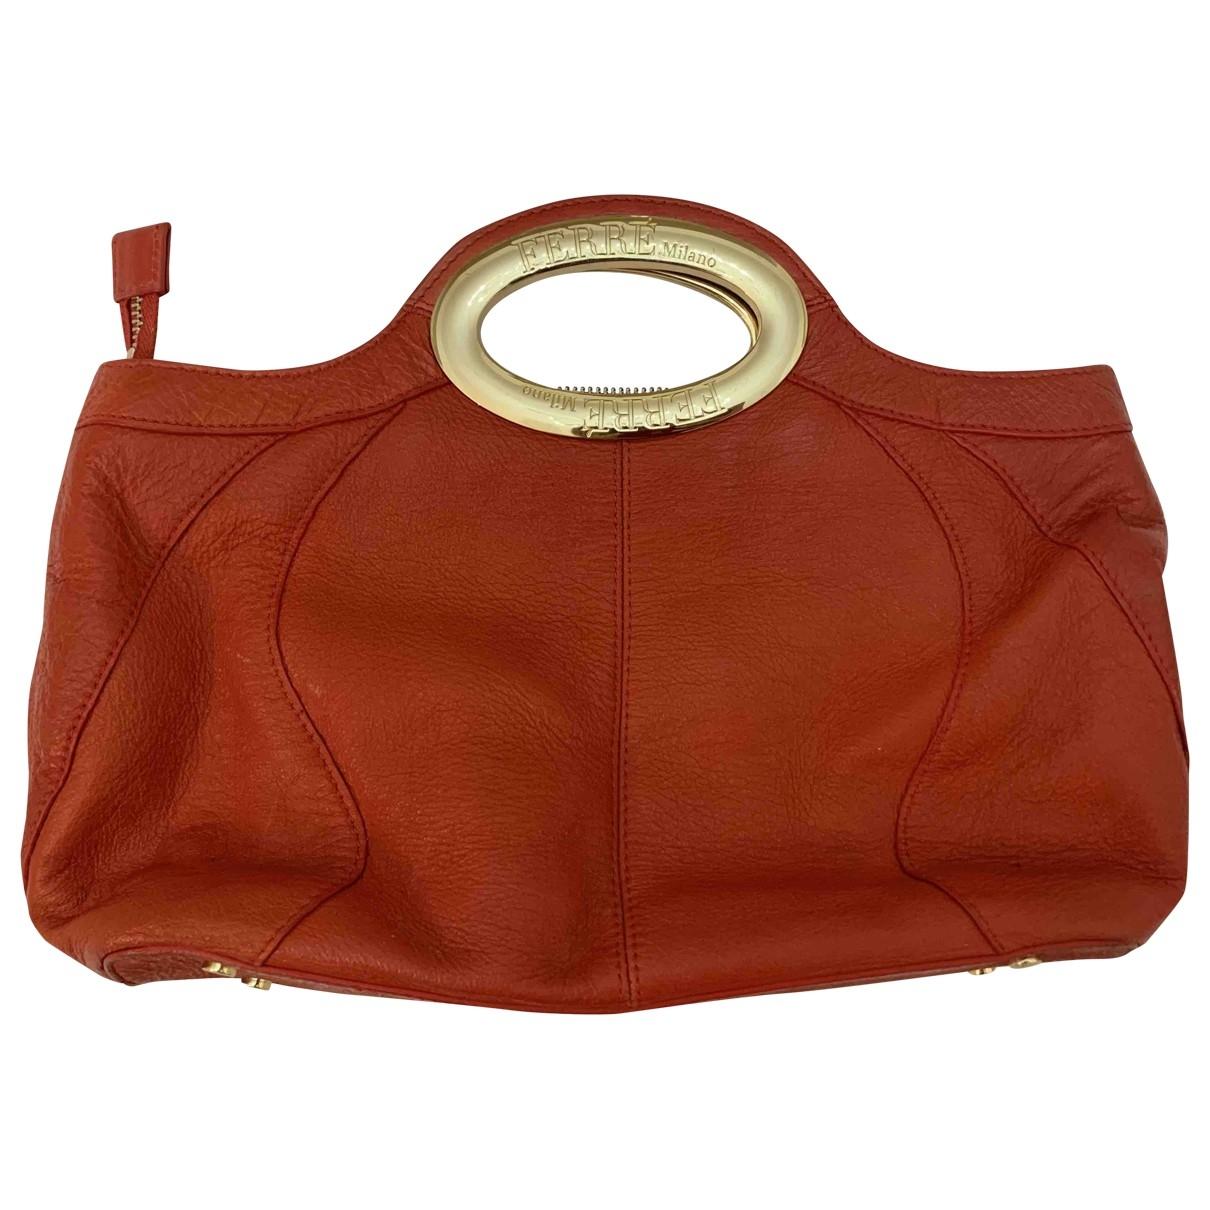 Gianfranco Ferre \N Handtasche in  Rot Leder